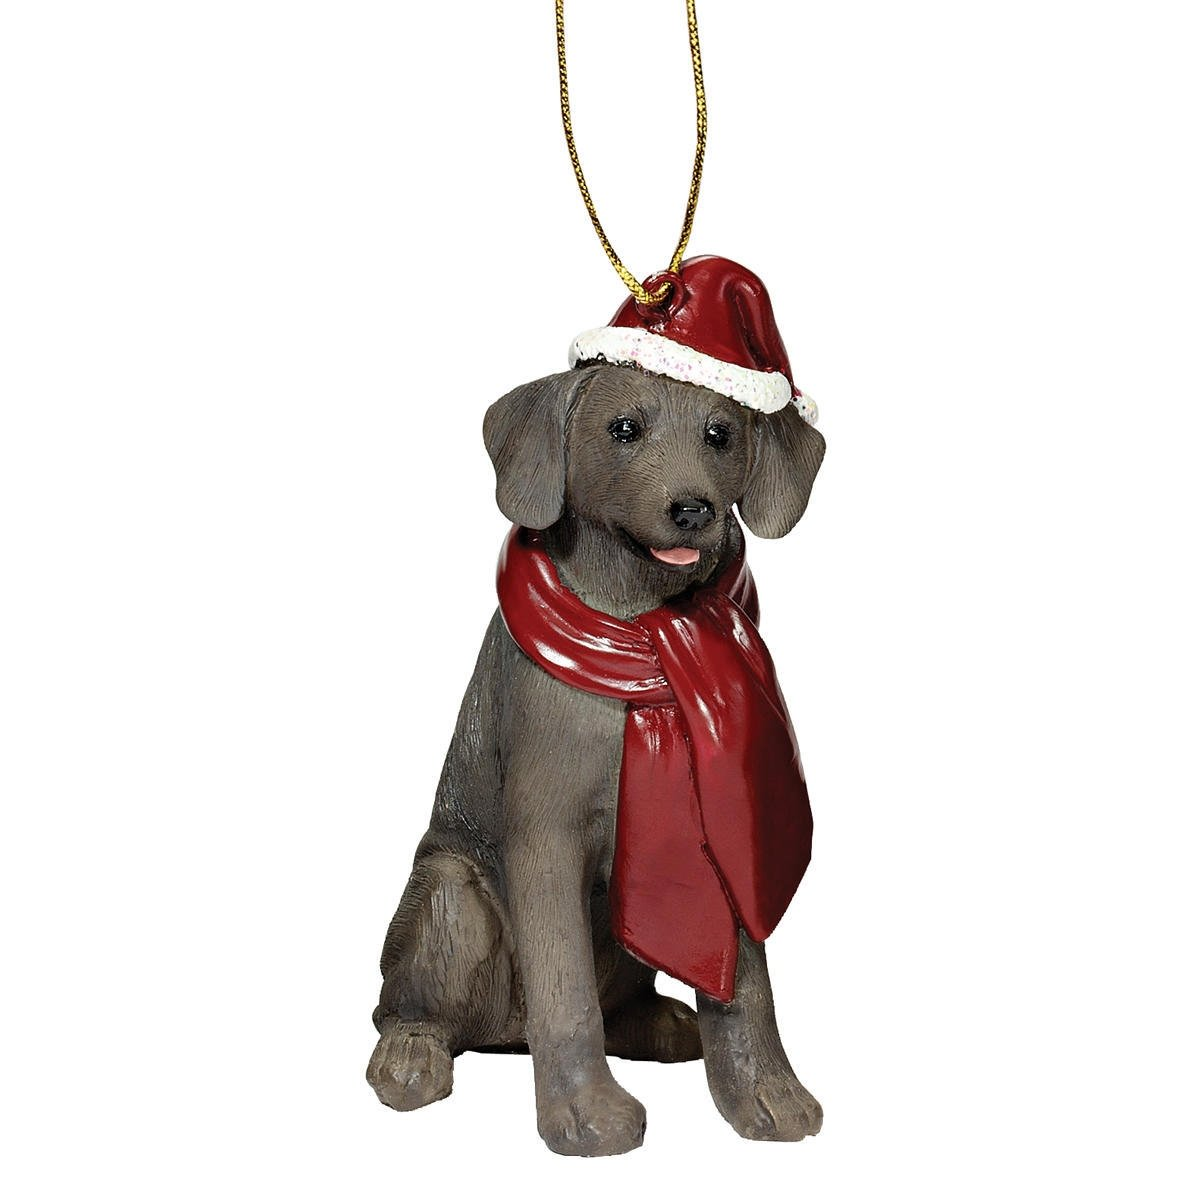 Design Toscano Christmas Ornaments - Xmas Weimaraner Holiday Dog Ornaments by Design Toscano (Image #1)